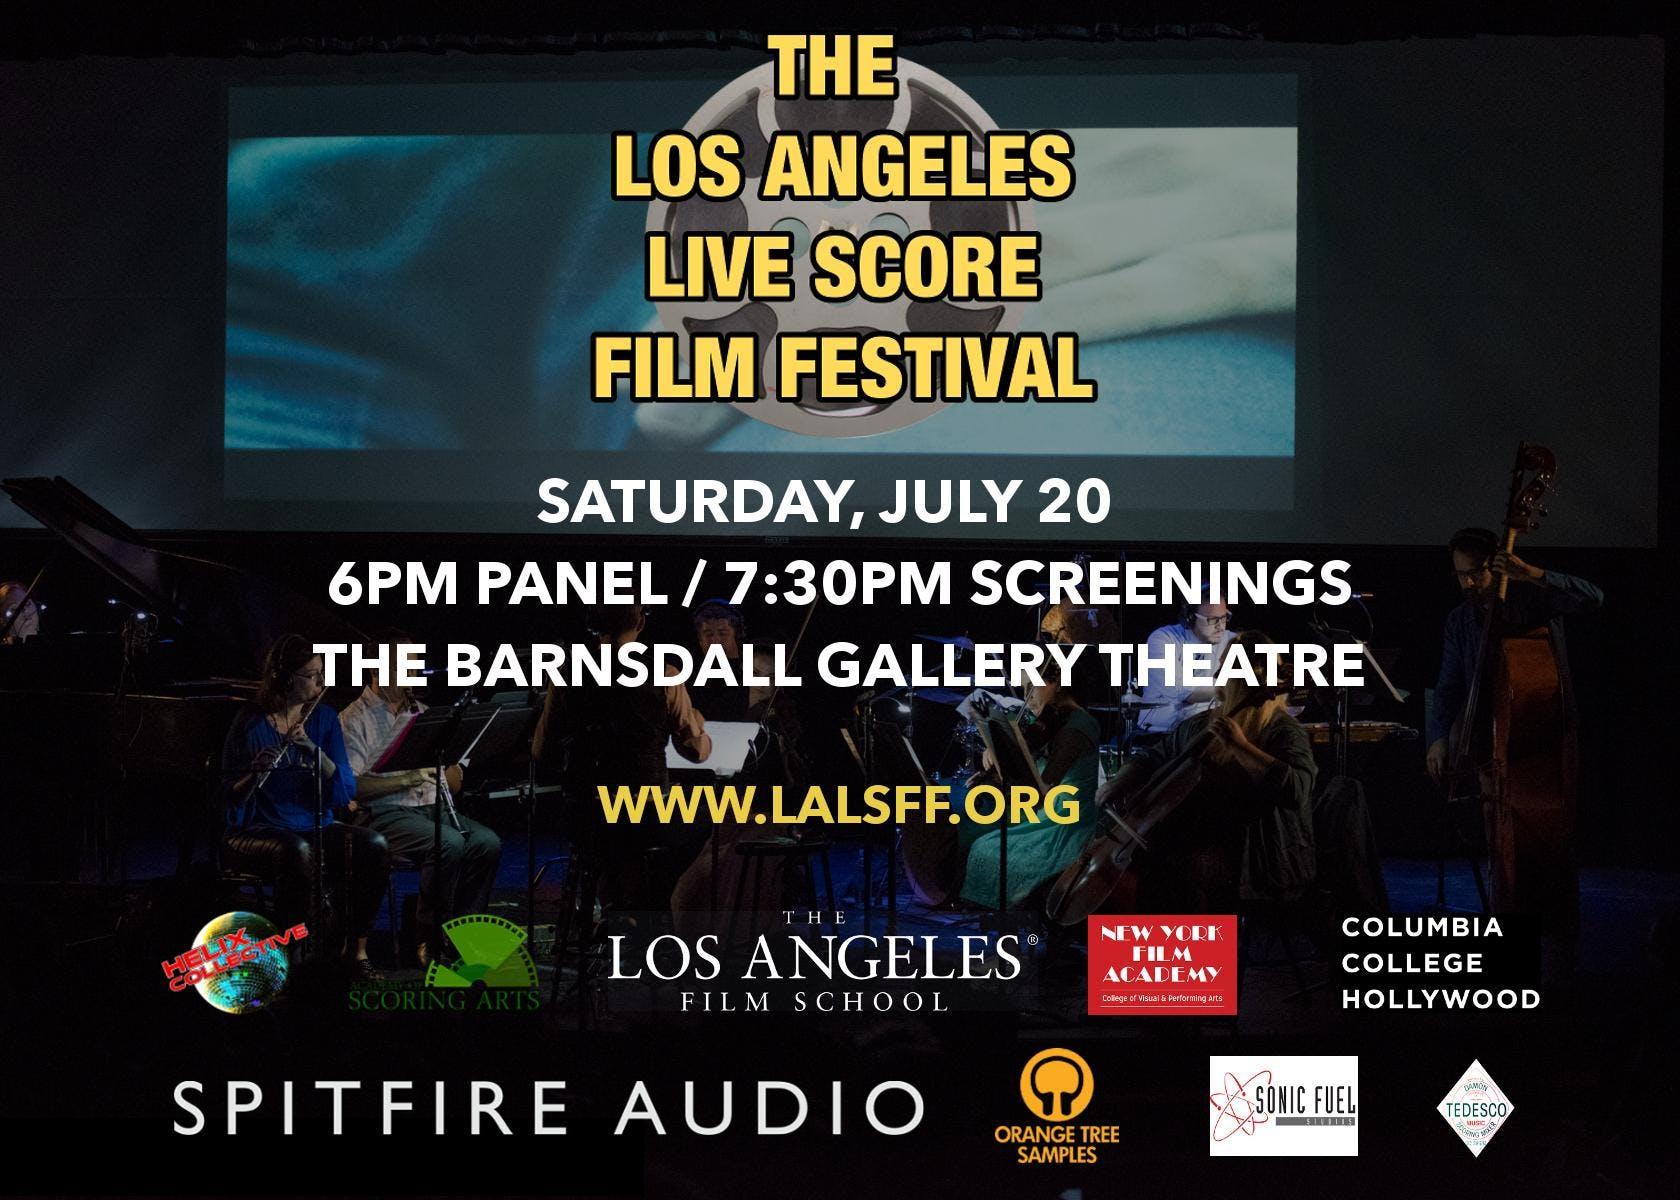 Los Angeles Live Score Film Festival 2019